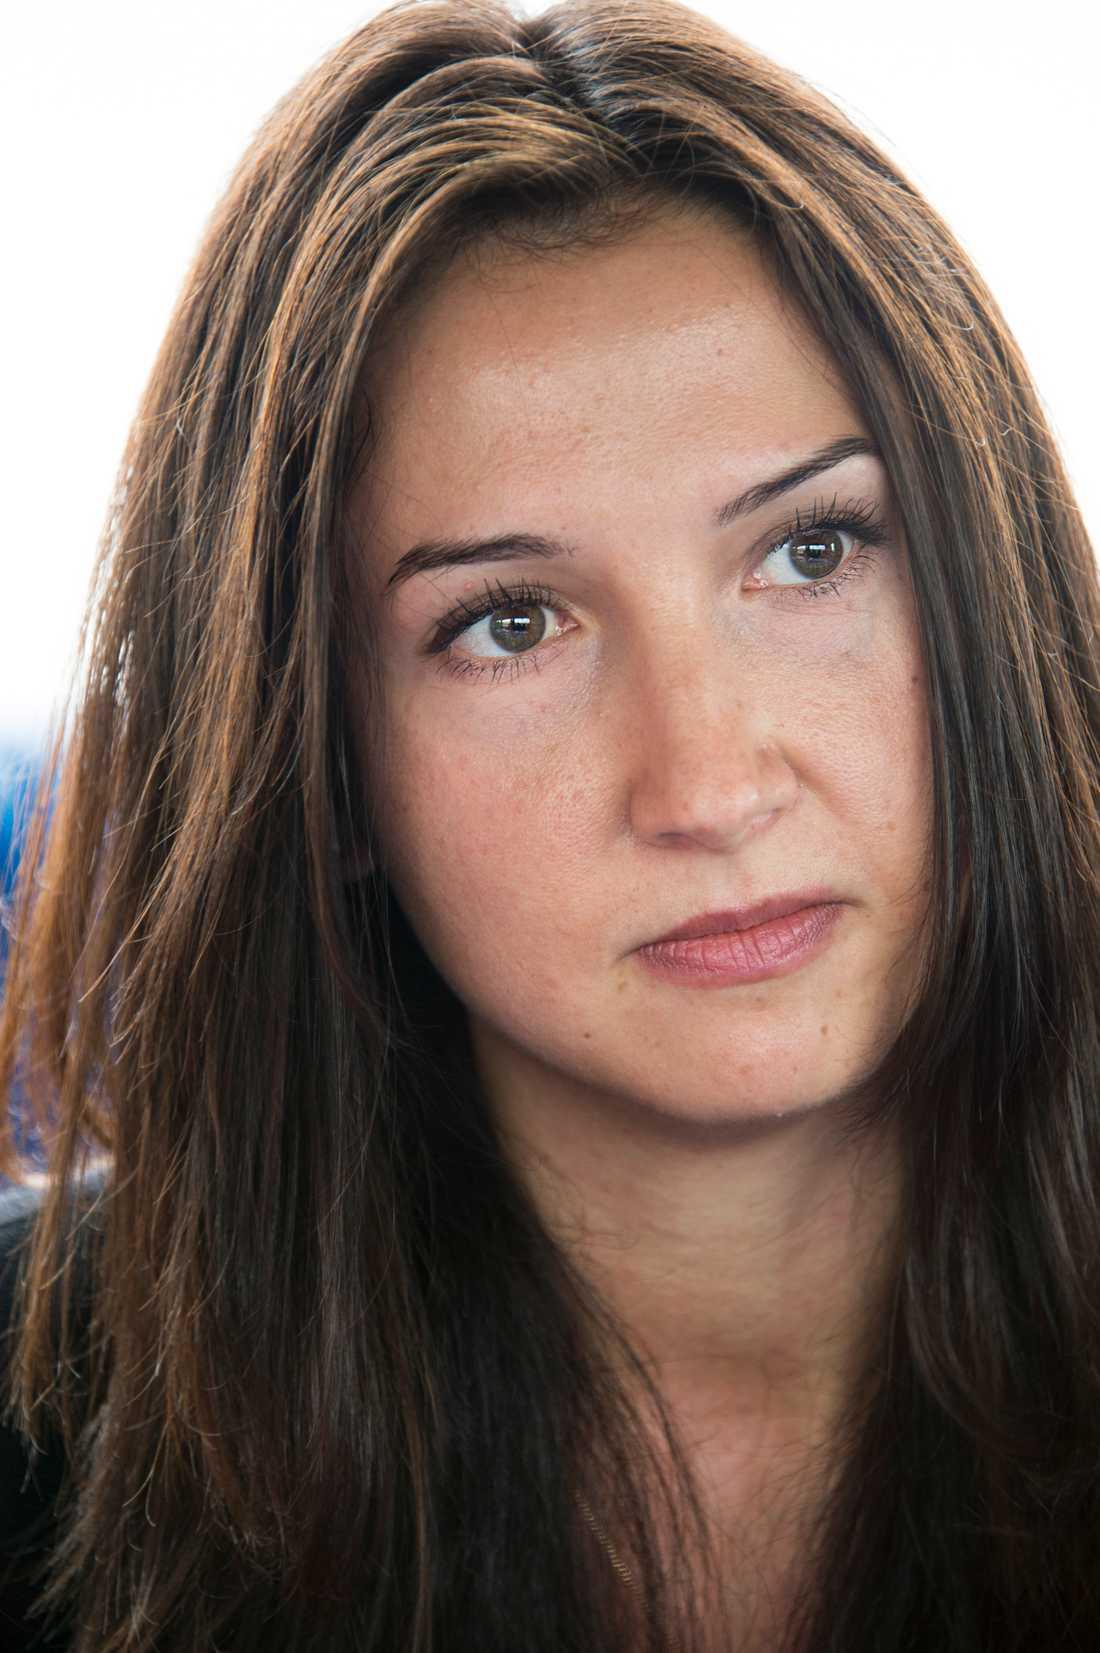 Aida Hadzialic anonym hemma - kändis på Balkan